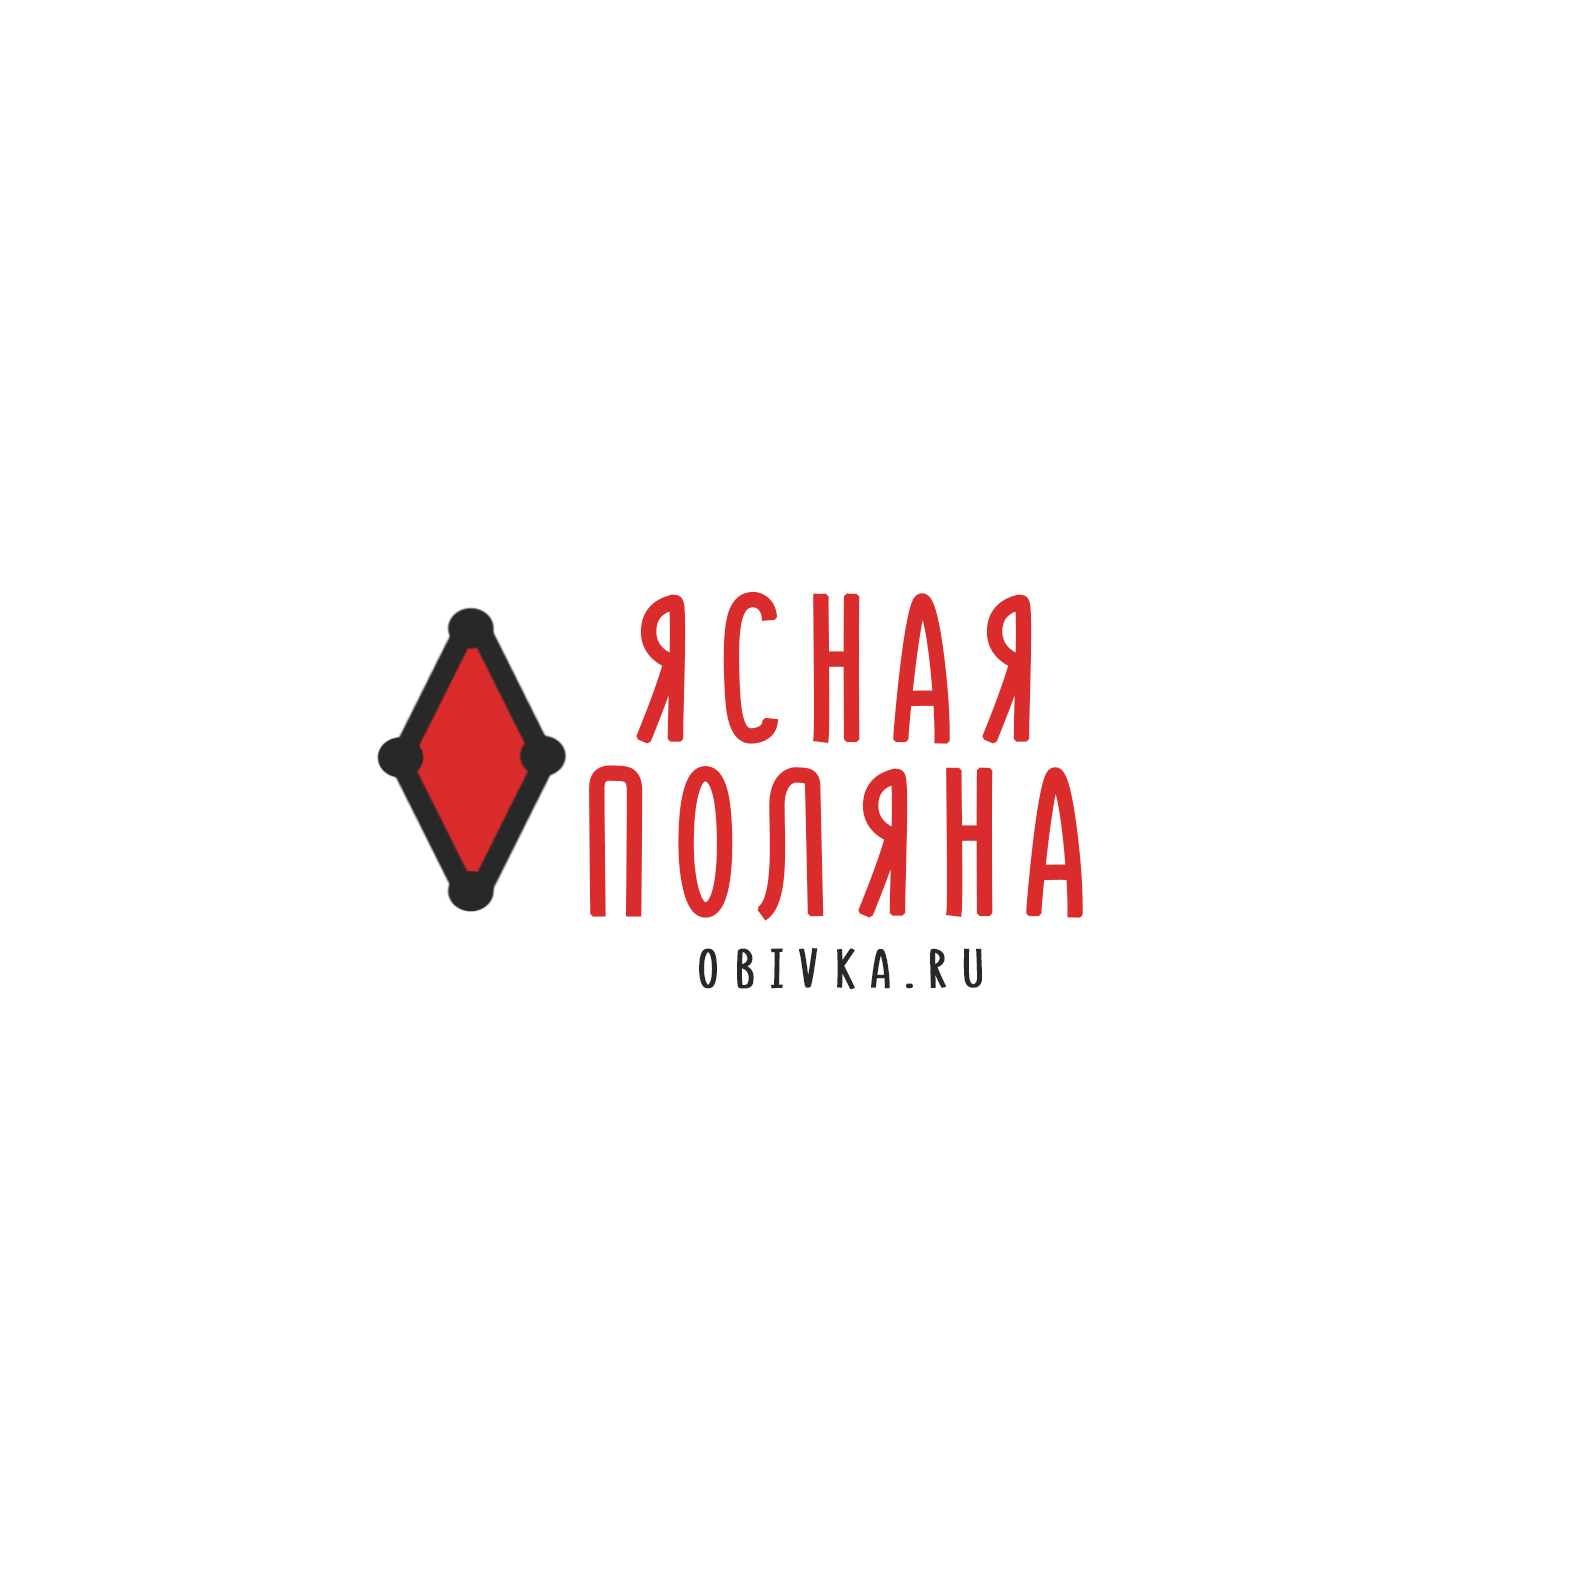 Логотип для сайта OBIVKA.RU фото f_8895c111412d3fad.jpg